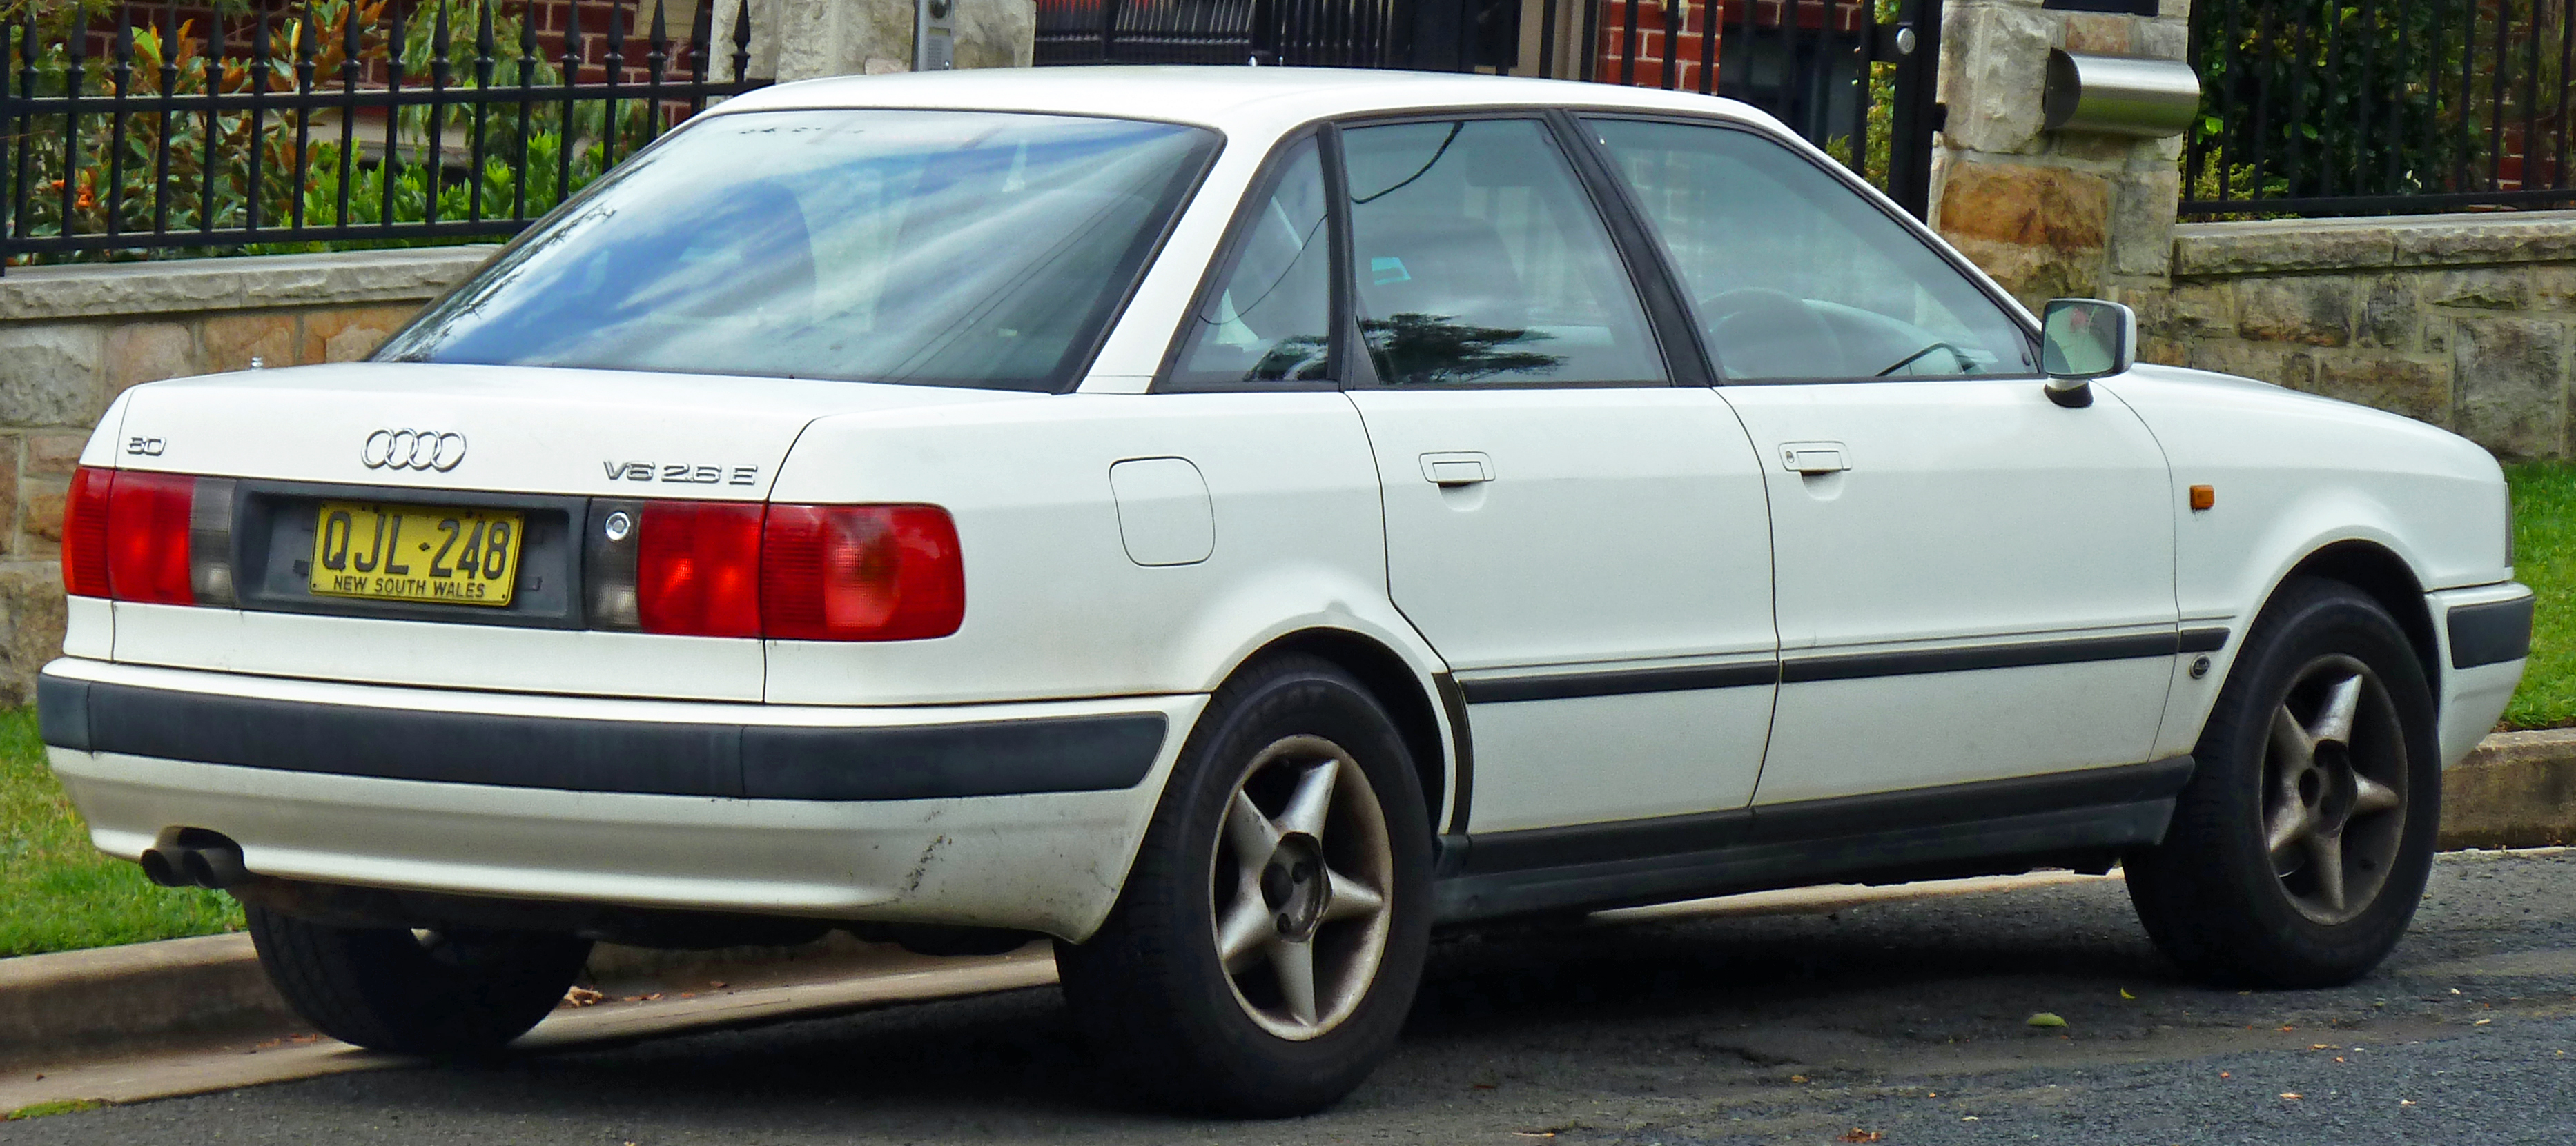 File 1995 Audi 80 8c 2 6 E Sedan 2011 04 02 02 Jpg